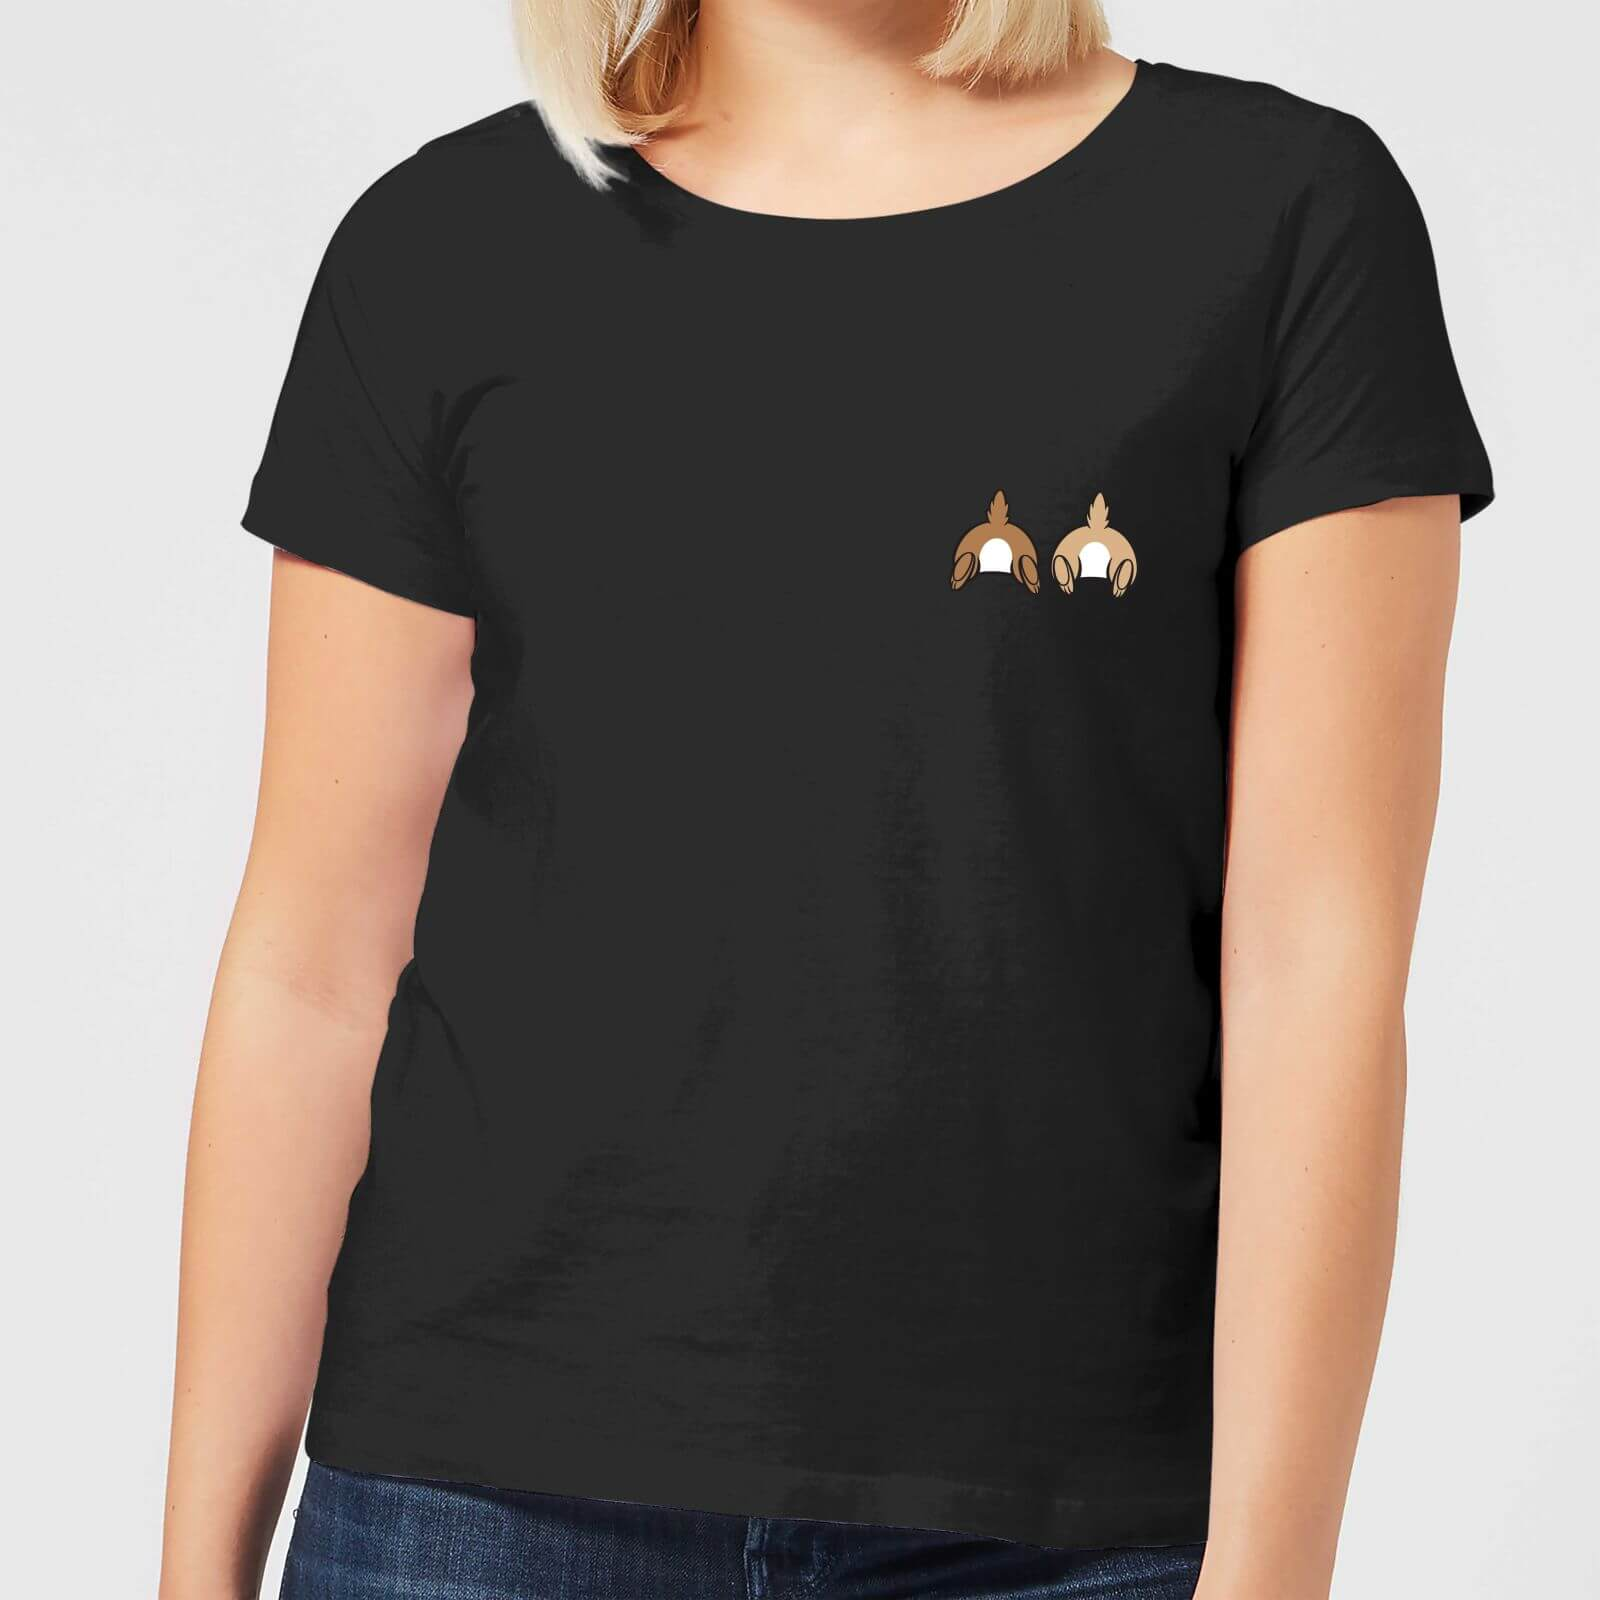 Disney Disney Chip And Dale Backside Women's T-Shirt - Black - 4XL - Black